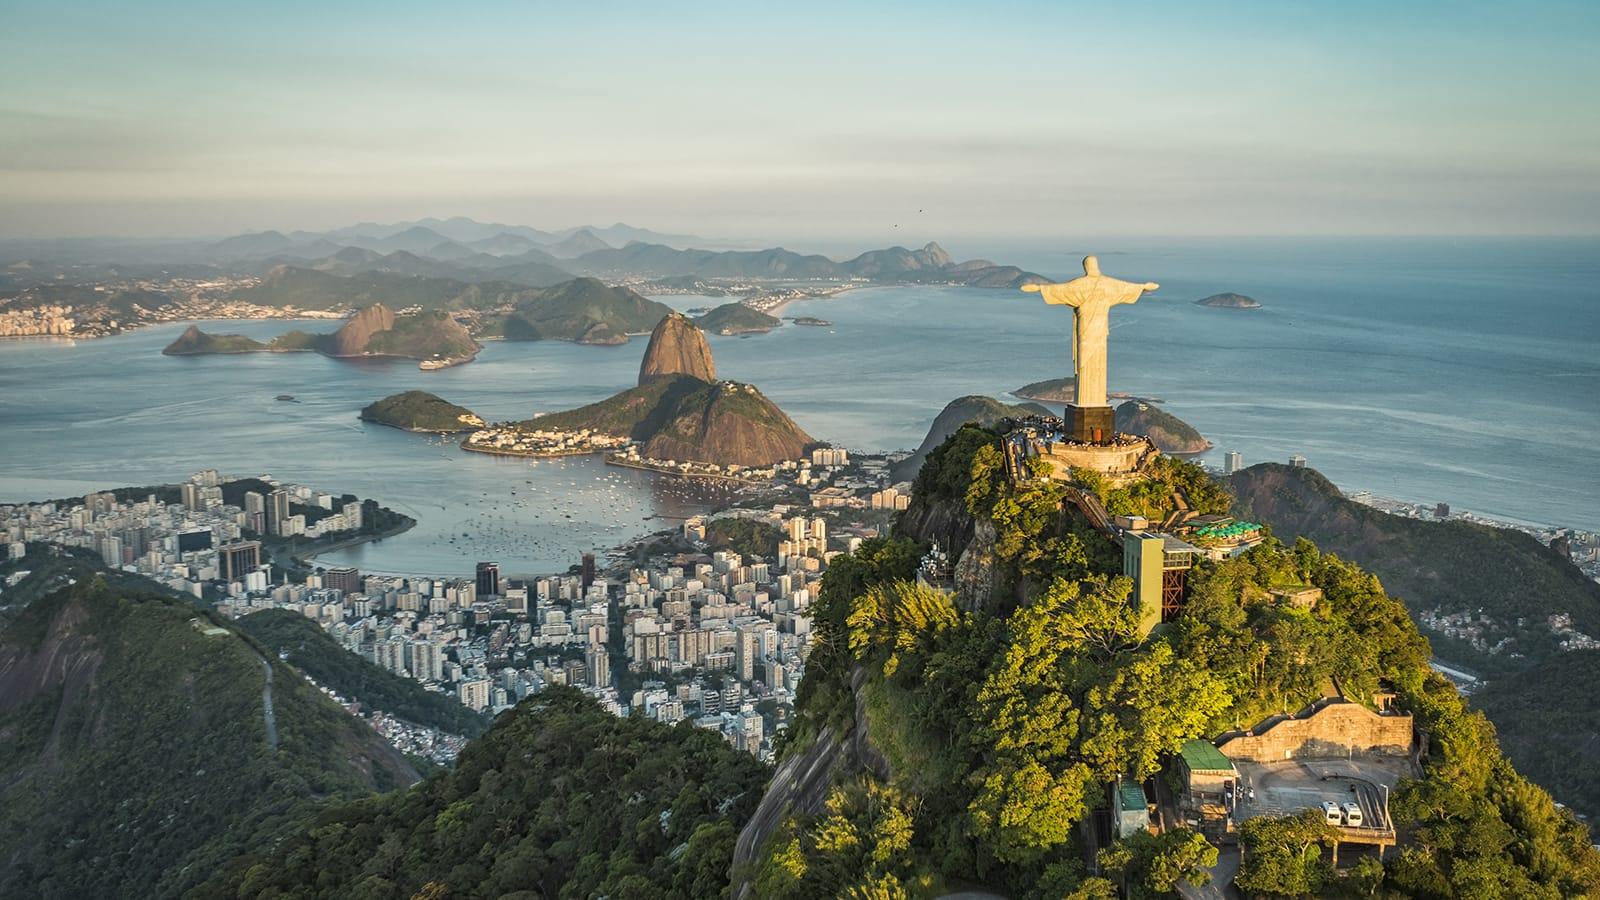 Brazil's national data privacy legislation comes into force